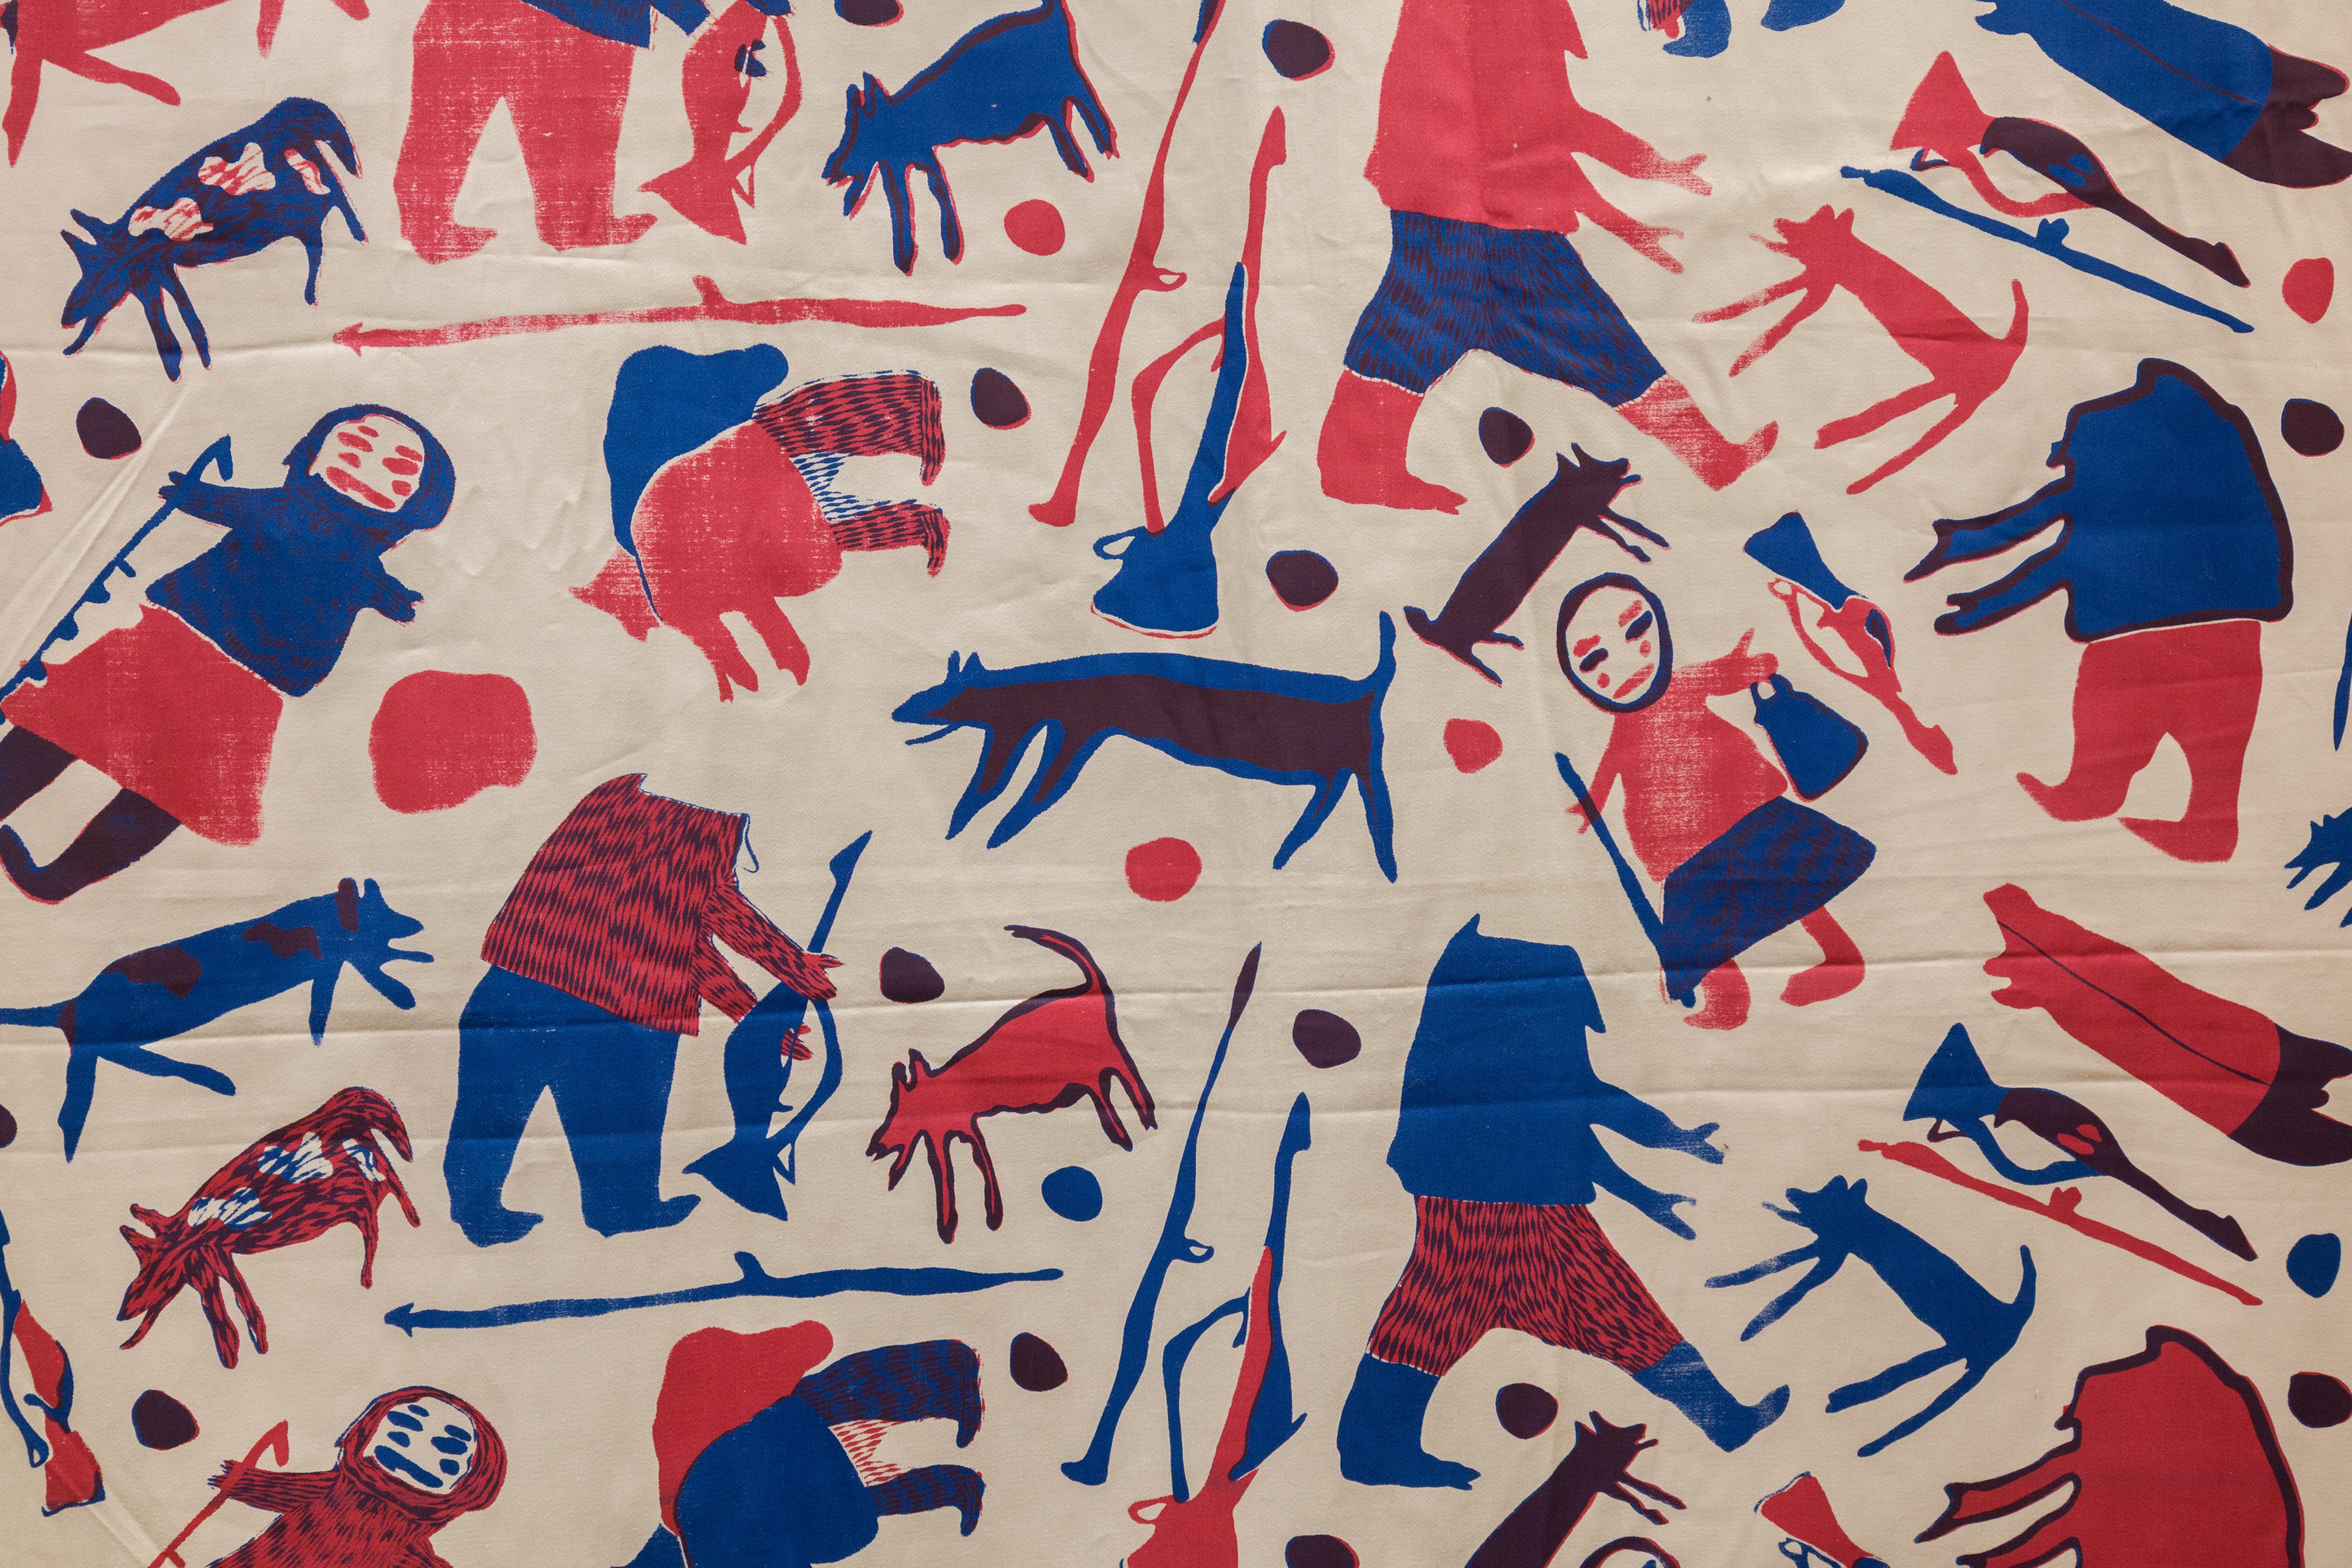 ᖃᓪᓗᓈᖅᑕᐃᑦ ᓯᑯᓯᓛᕐᒥᑦ Printed Textiles from Kinngait Studios